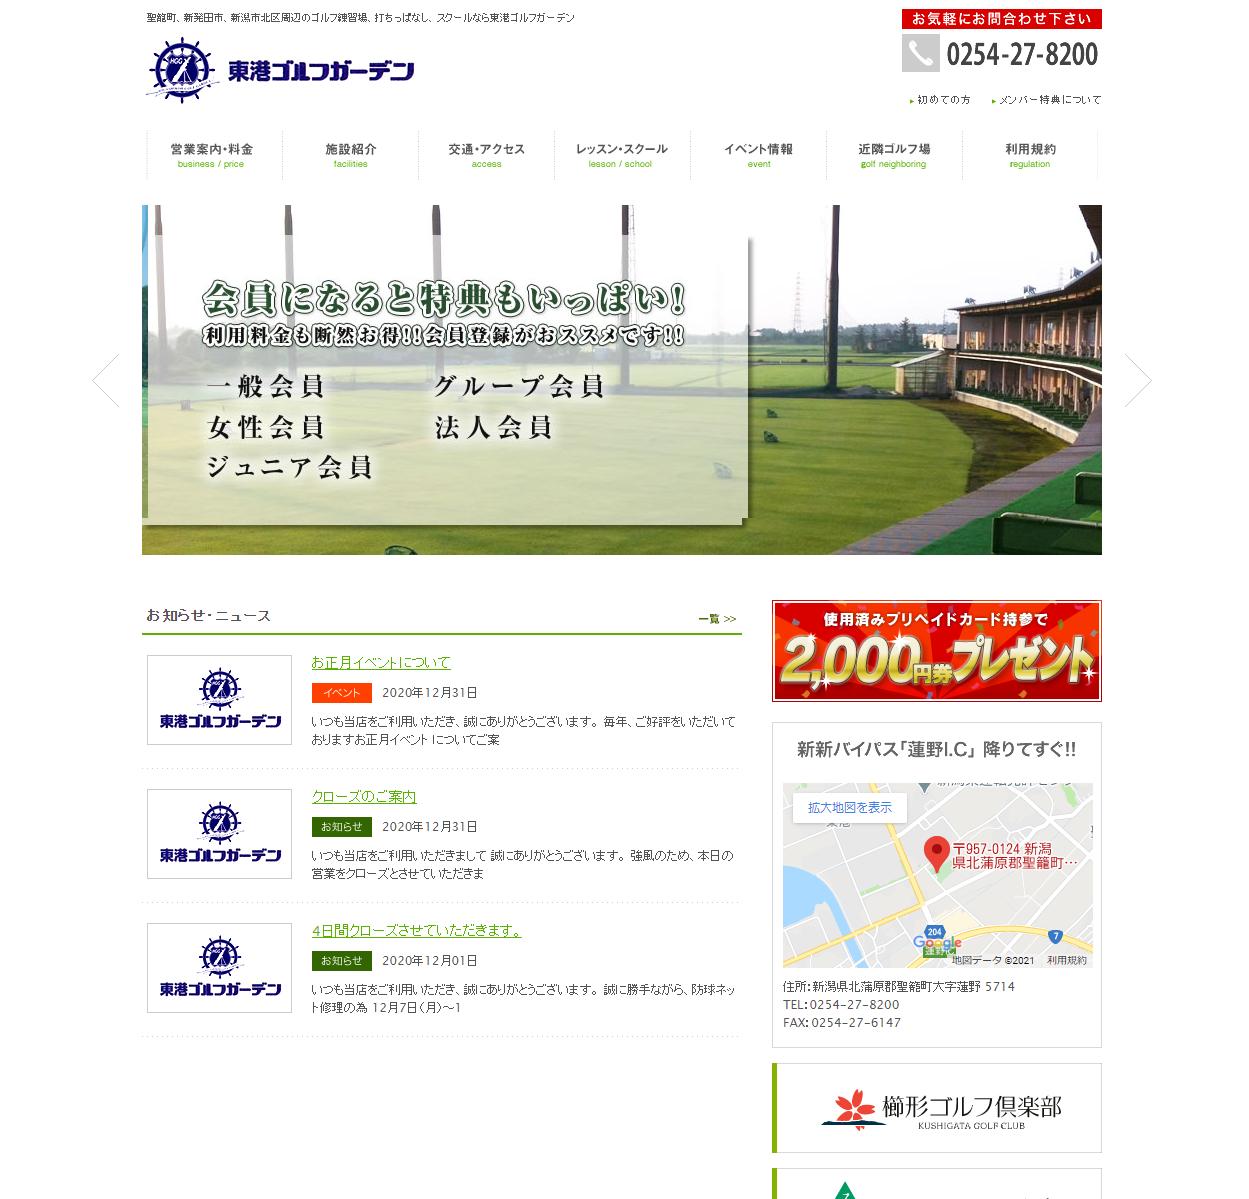 "<span class=""title"">東港ゴルフガーデンの口コミや評判</span>"